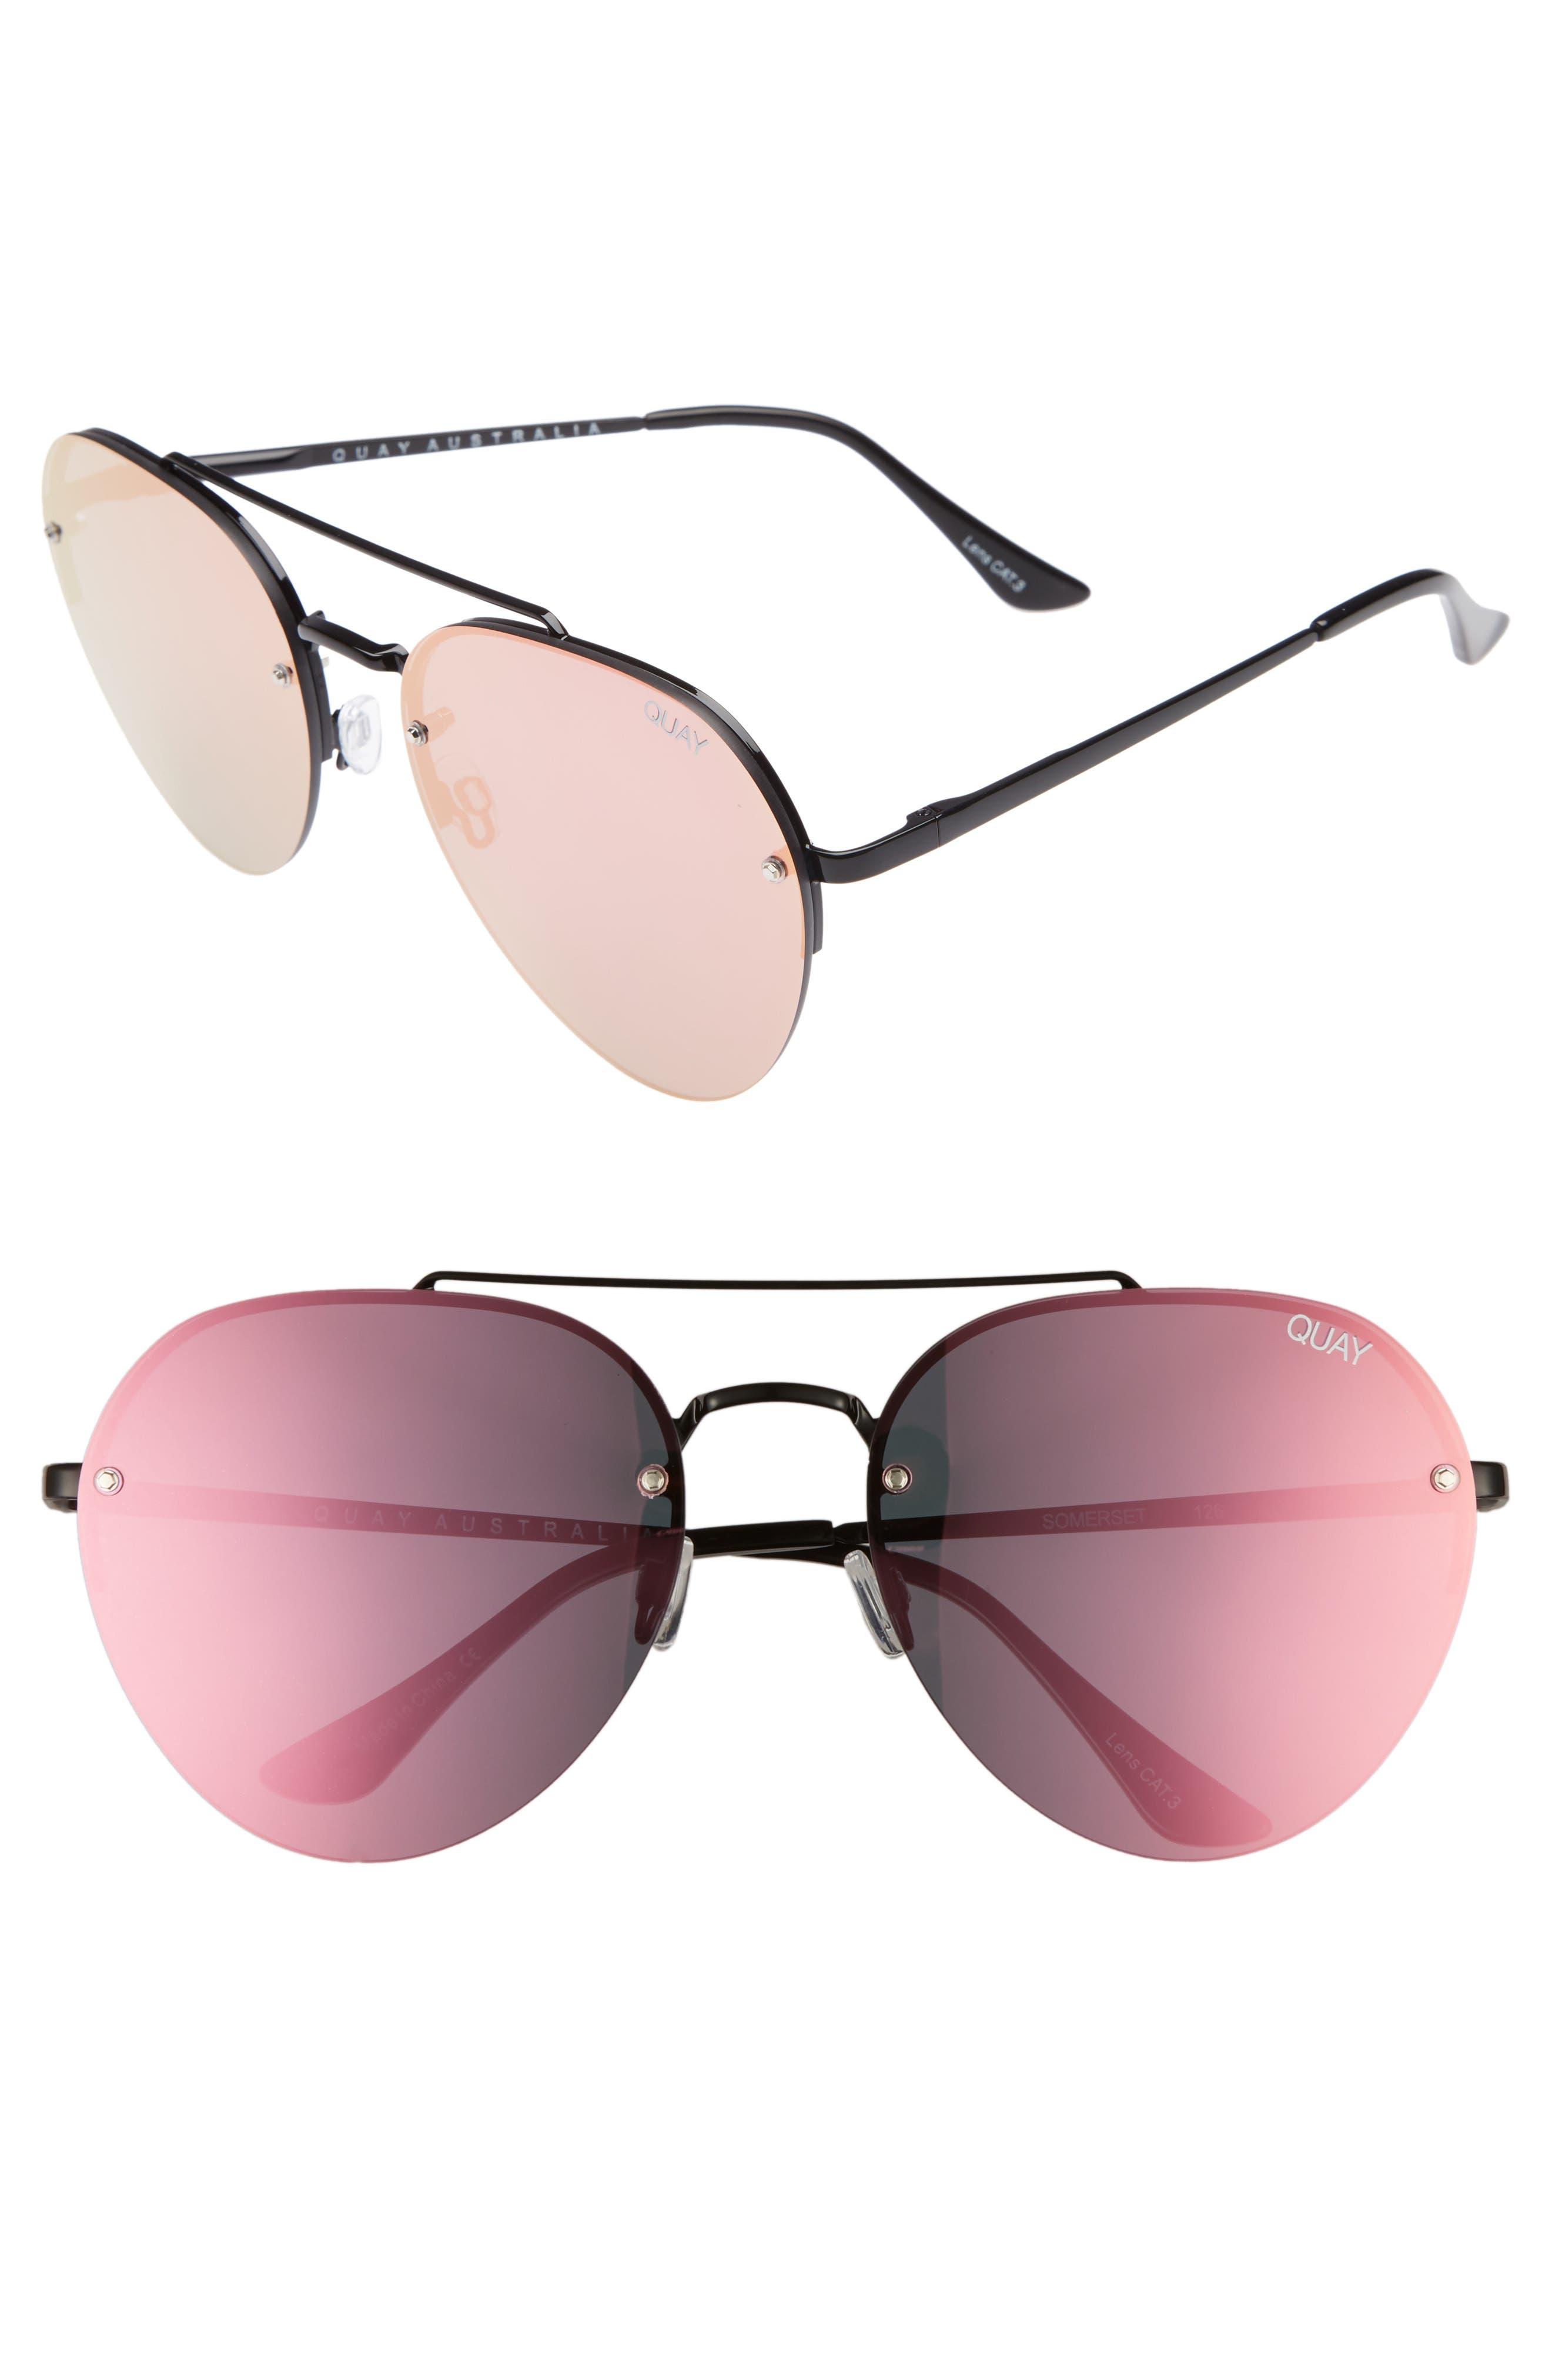 Somerset 65mm Aviator Sunglasses,                         Main,                         color, Black/ Pink